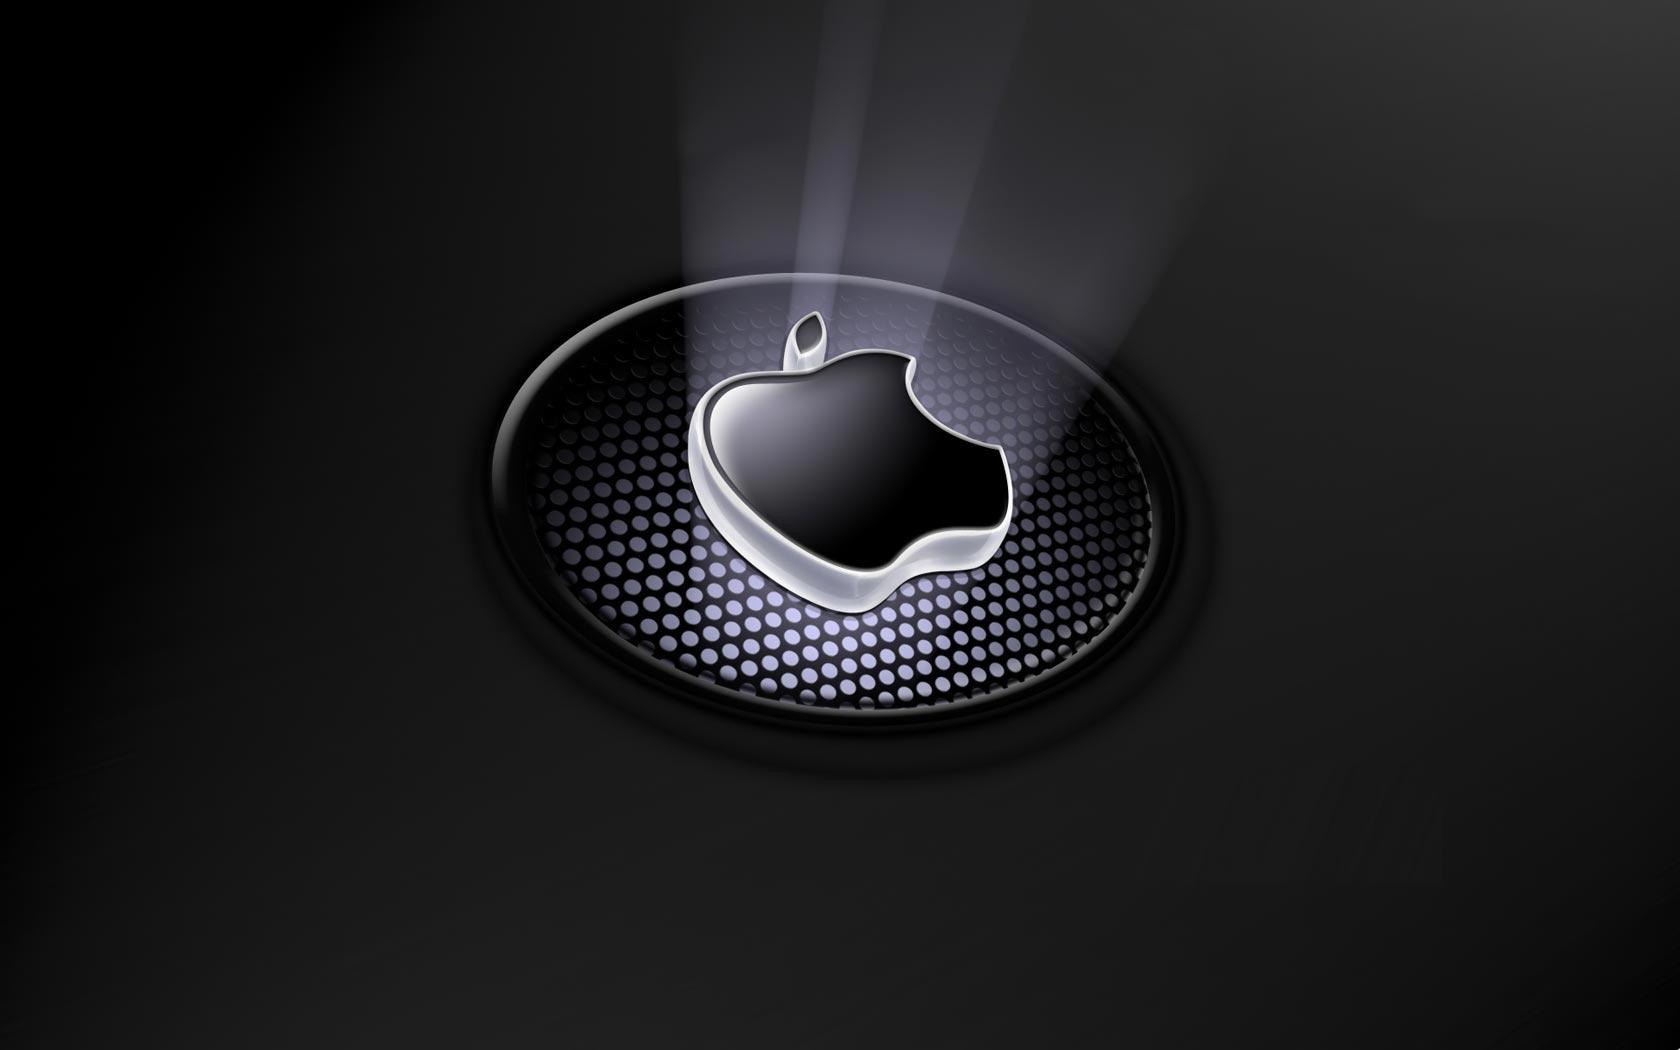 Apple Desktop Wallpapers Group (77+)